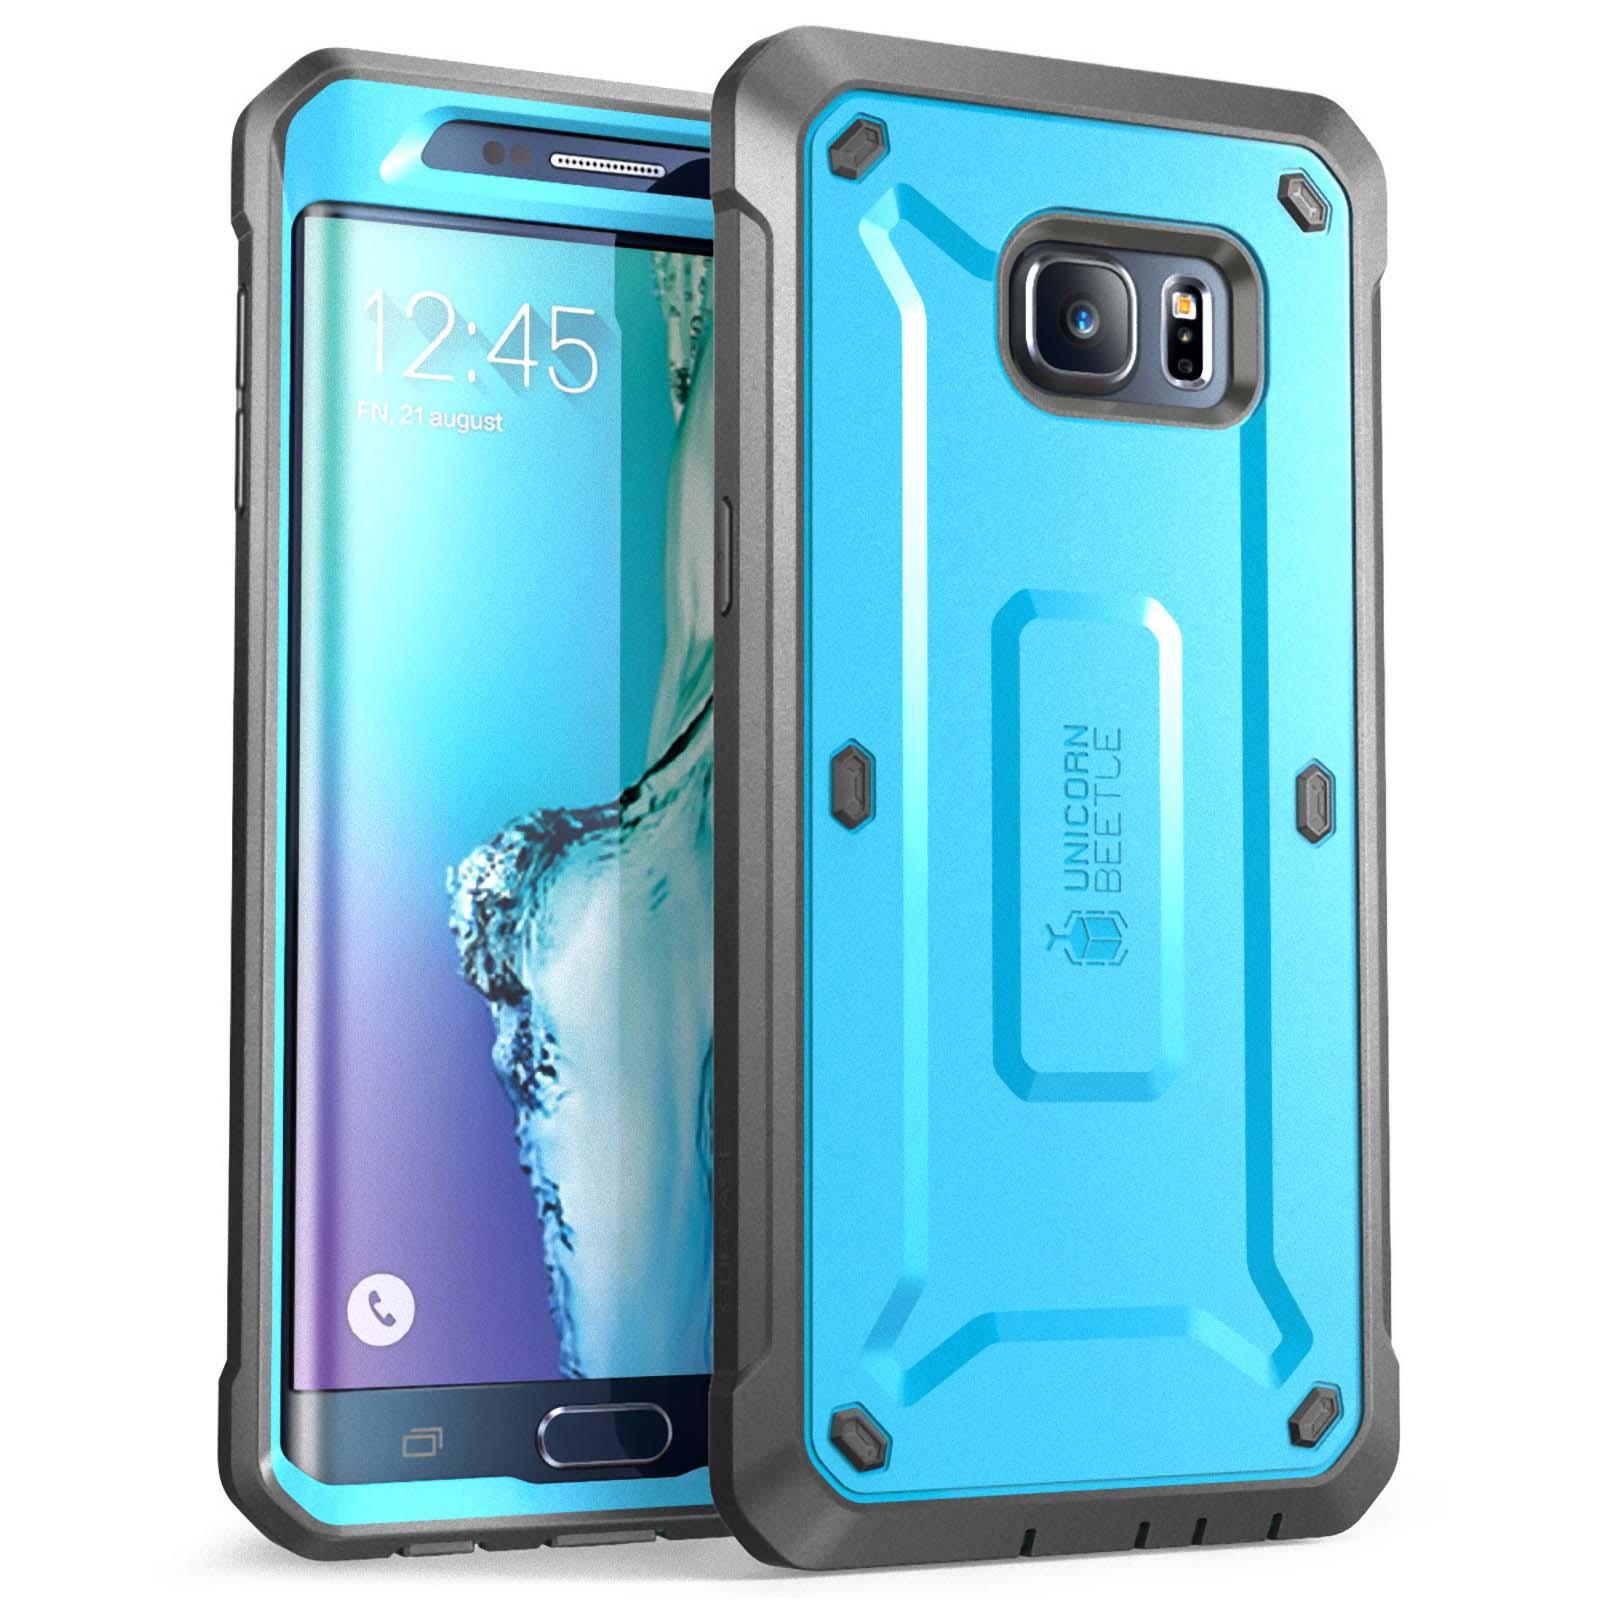 Supcase SUP-GS6-EdgePlus-UBPro-Blue/Black Samsung Galaxy S6 Edge+ Case Blue Black PartNumber: 00357088000P KsnValue: 9205570 MfgPartNumber: 4IBS82491